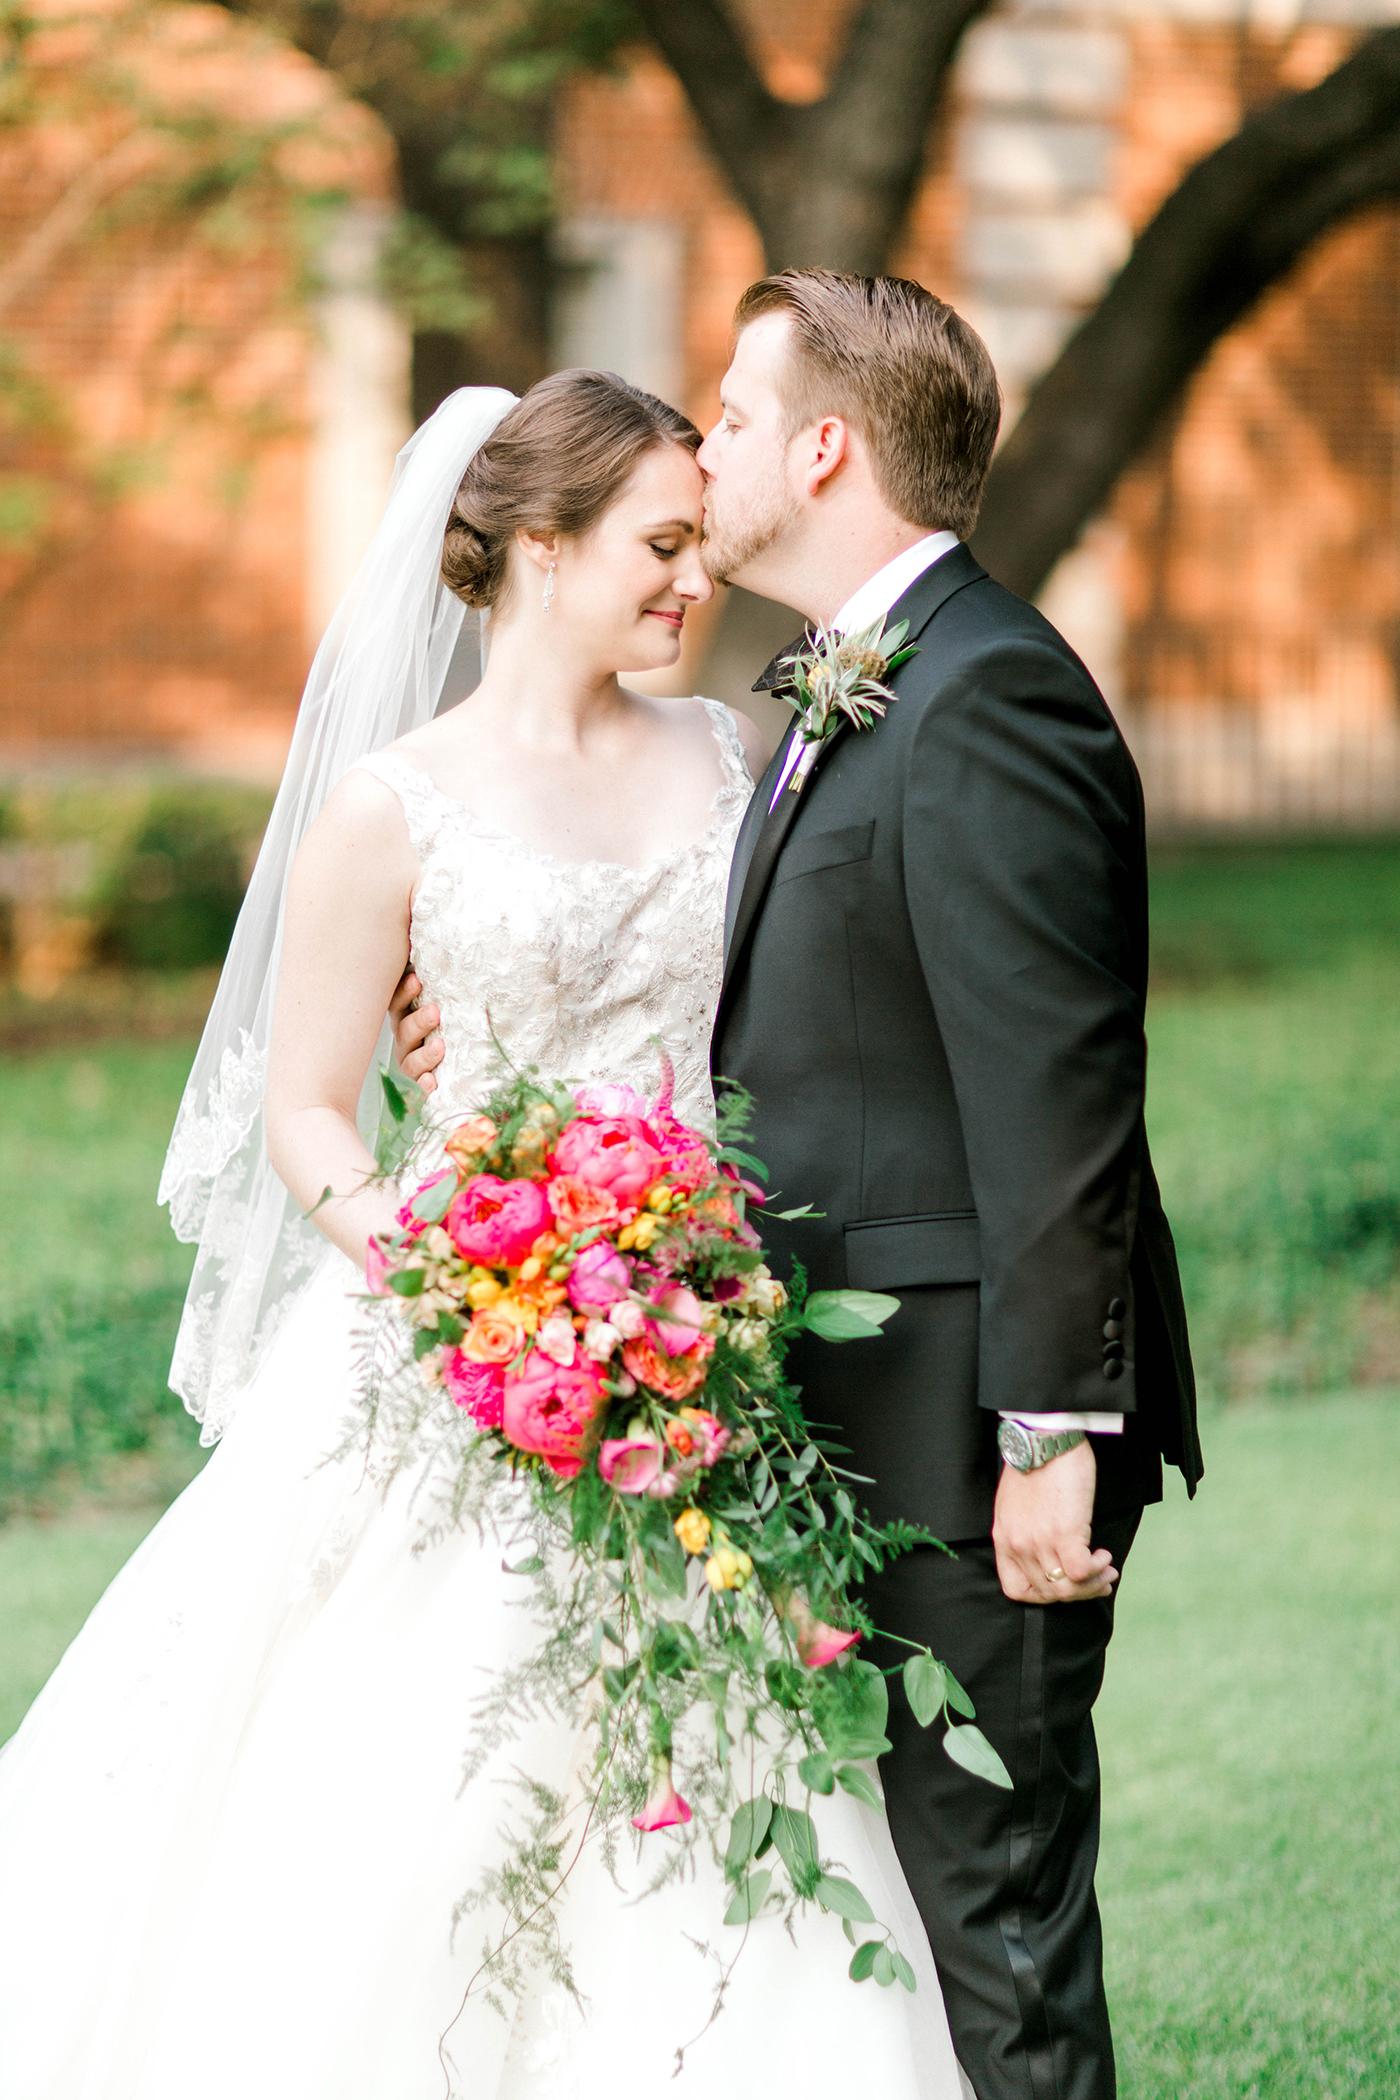 Dallas TX Wedding Planner - Allday Events - Hall on Dragon Wedding - 00013.jpg